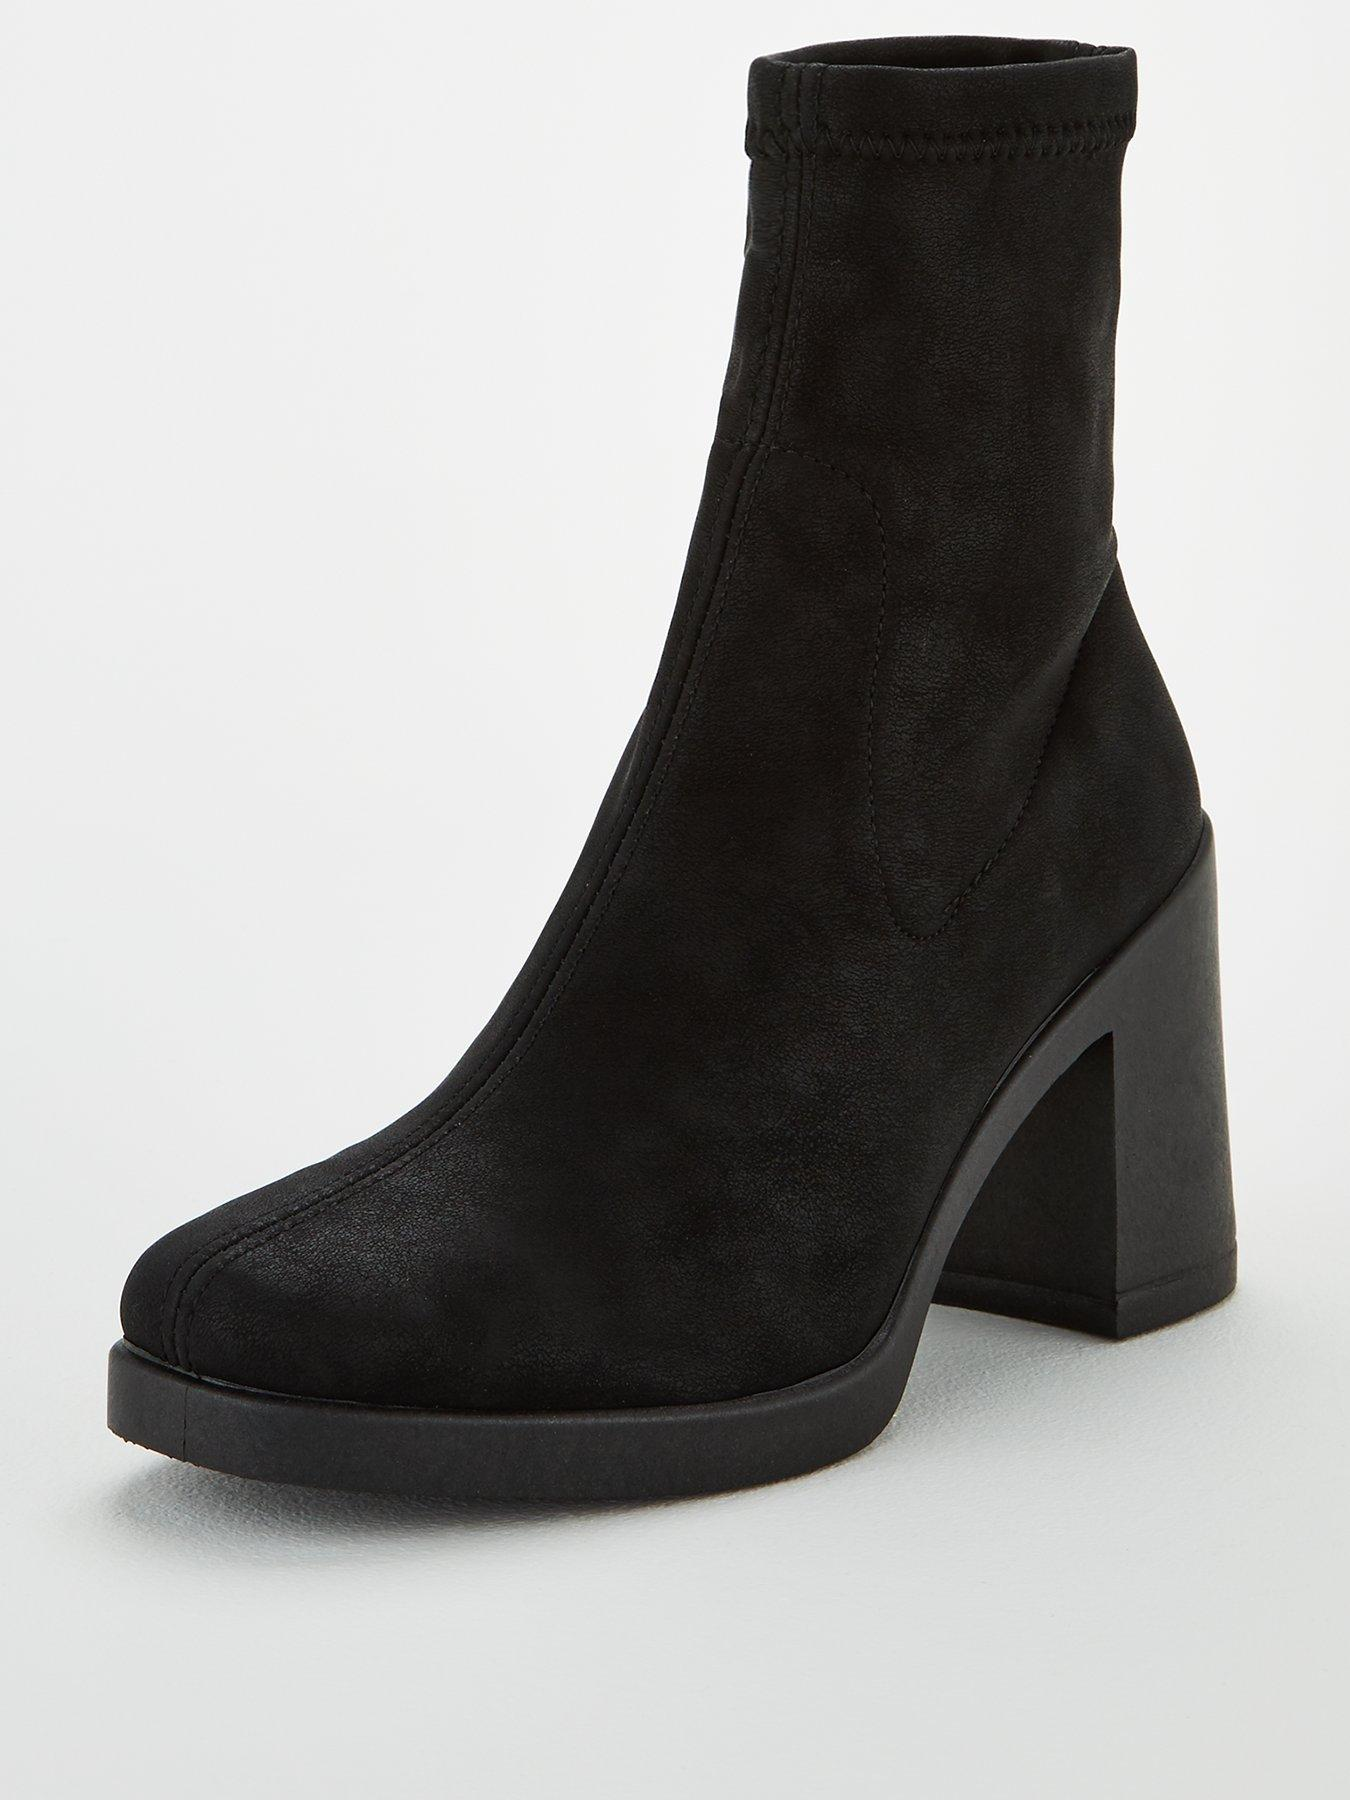 Women's Shoes & Boots | Online Shopping | Littlewoods Ireland